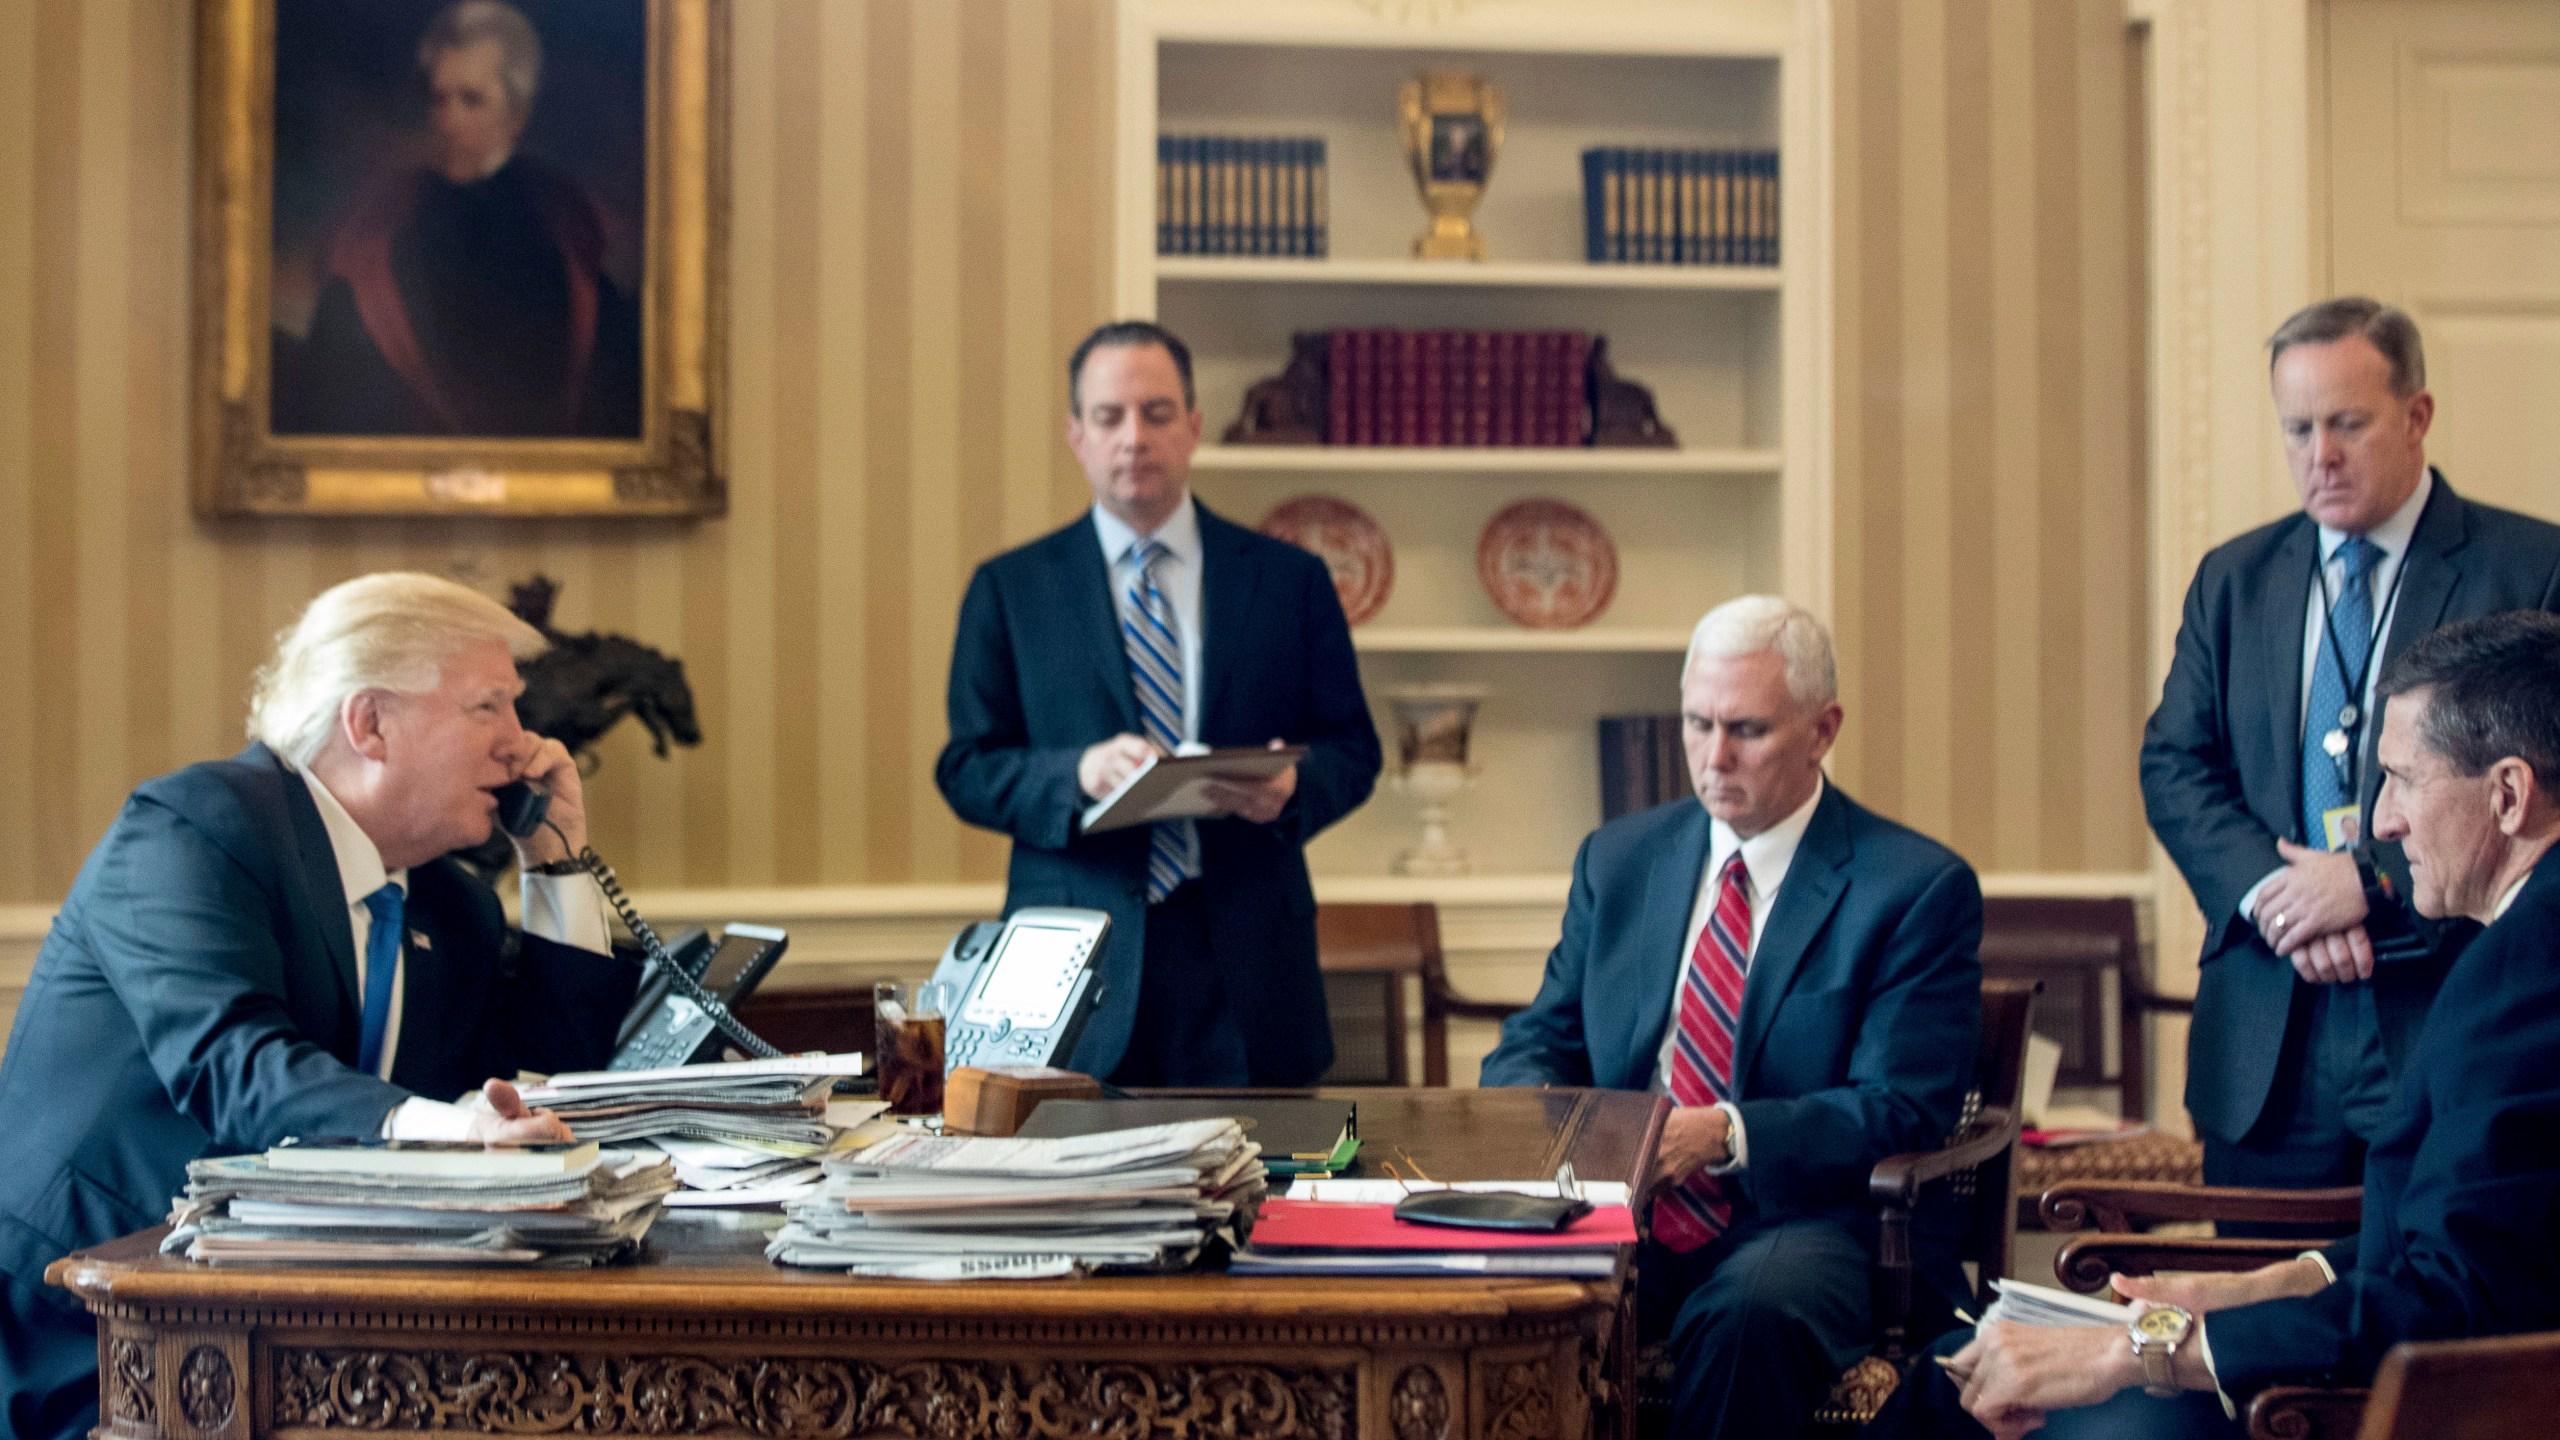 Donald Trump, Reince Priebus, Mike Pence, Sean Spicer, Michael Flynn_527816